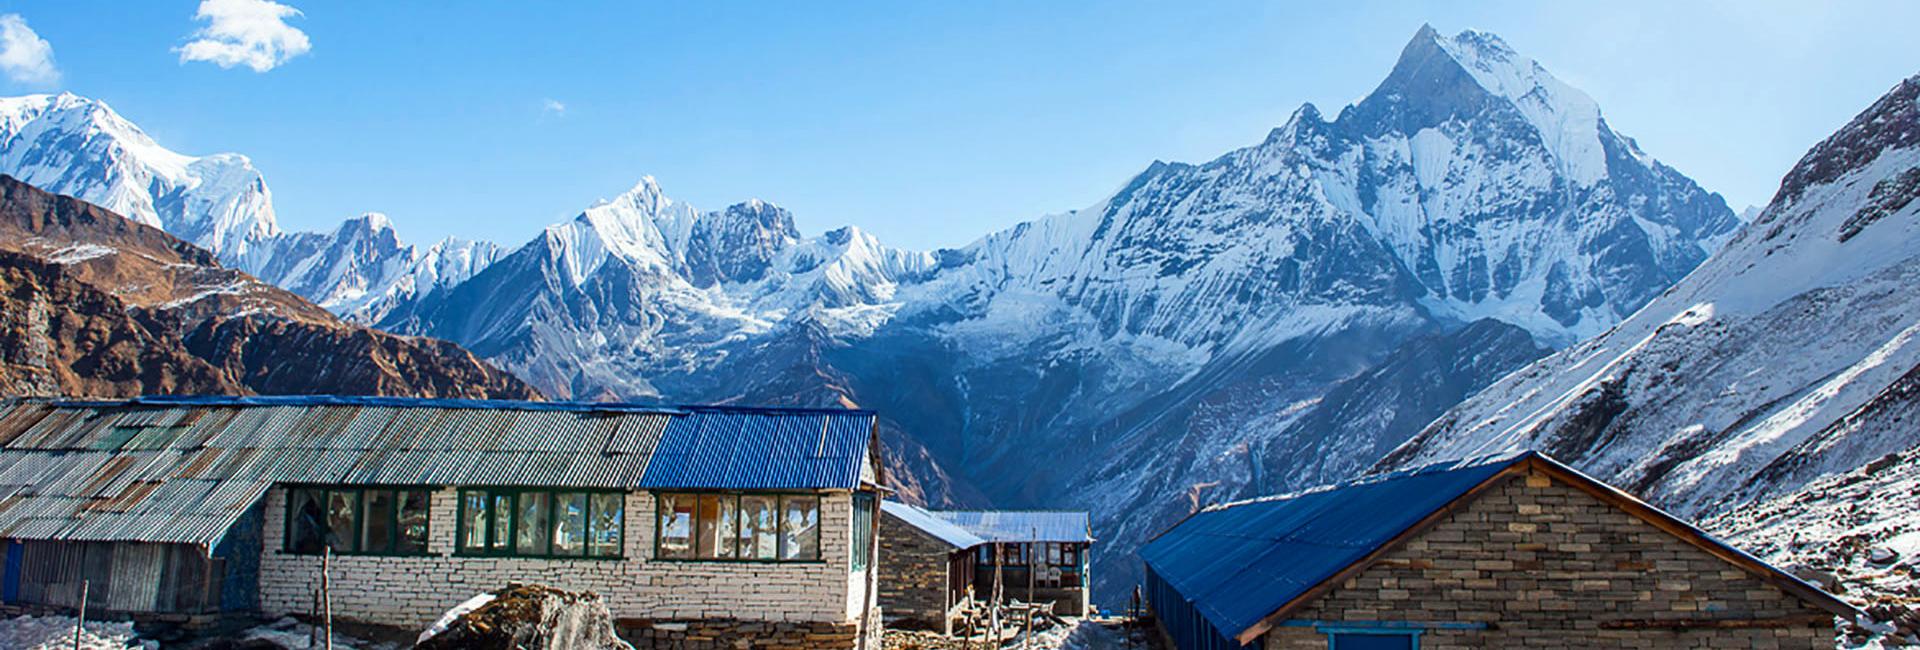 АBС | Трек к базовому лагерю Аннапурны + Марди Химал